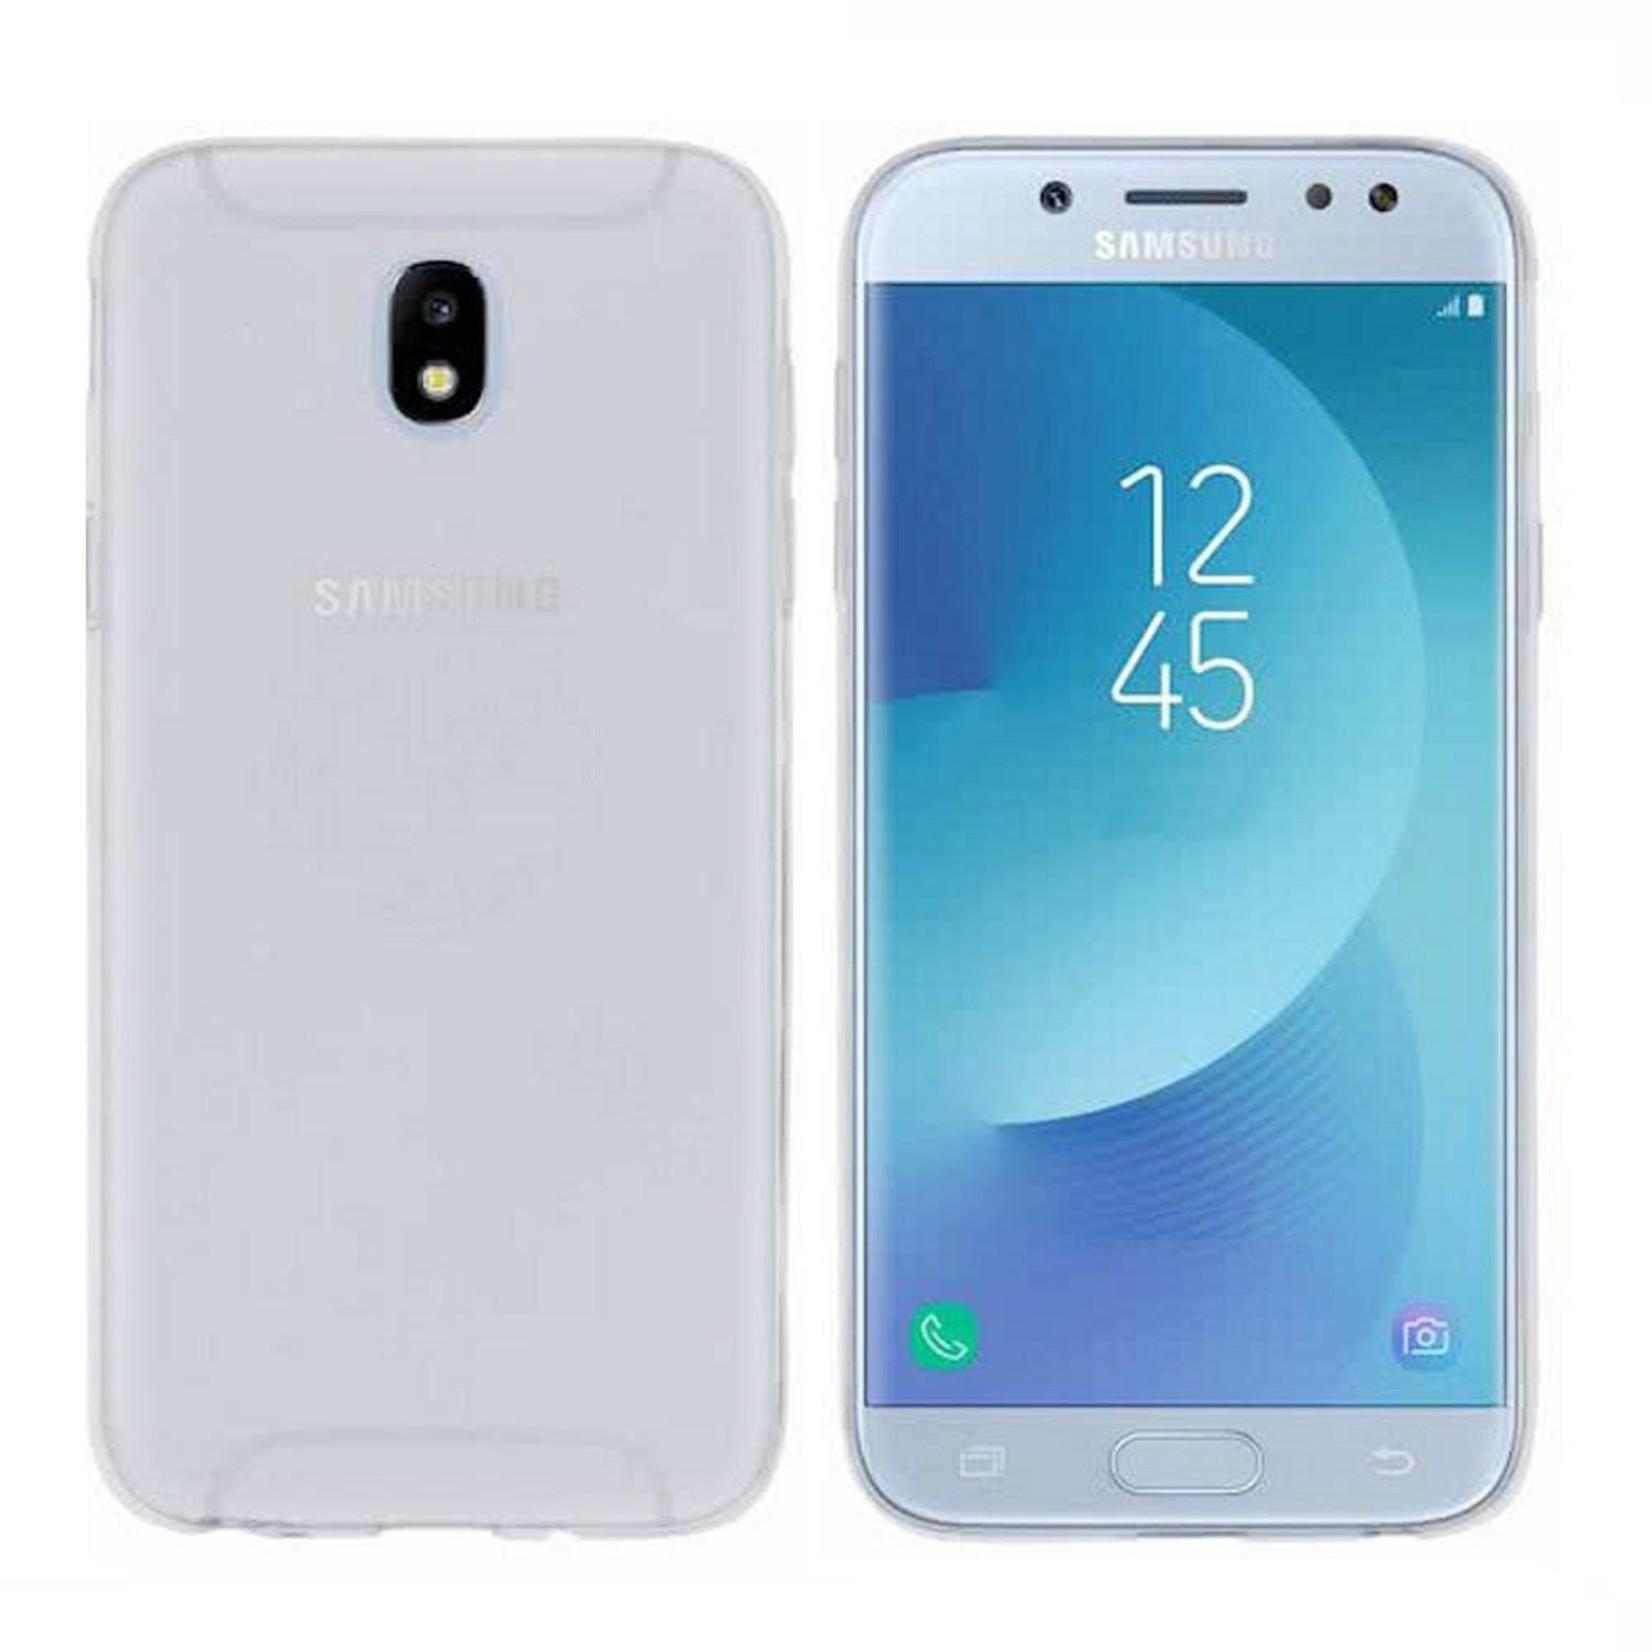 Colorfone Hoesje CoolSkin3T voor Samsung J5 2017 Transparant Wit